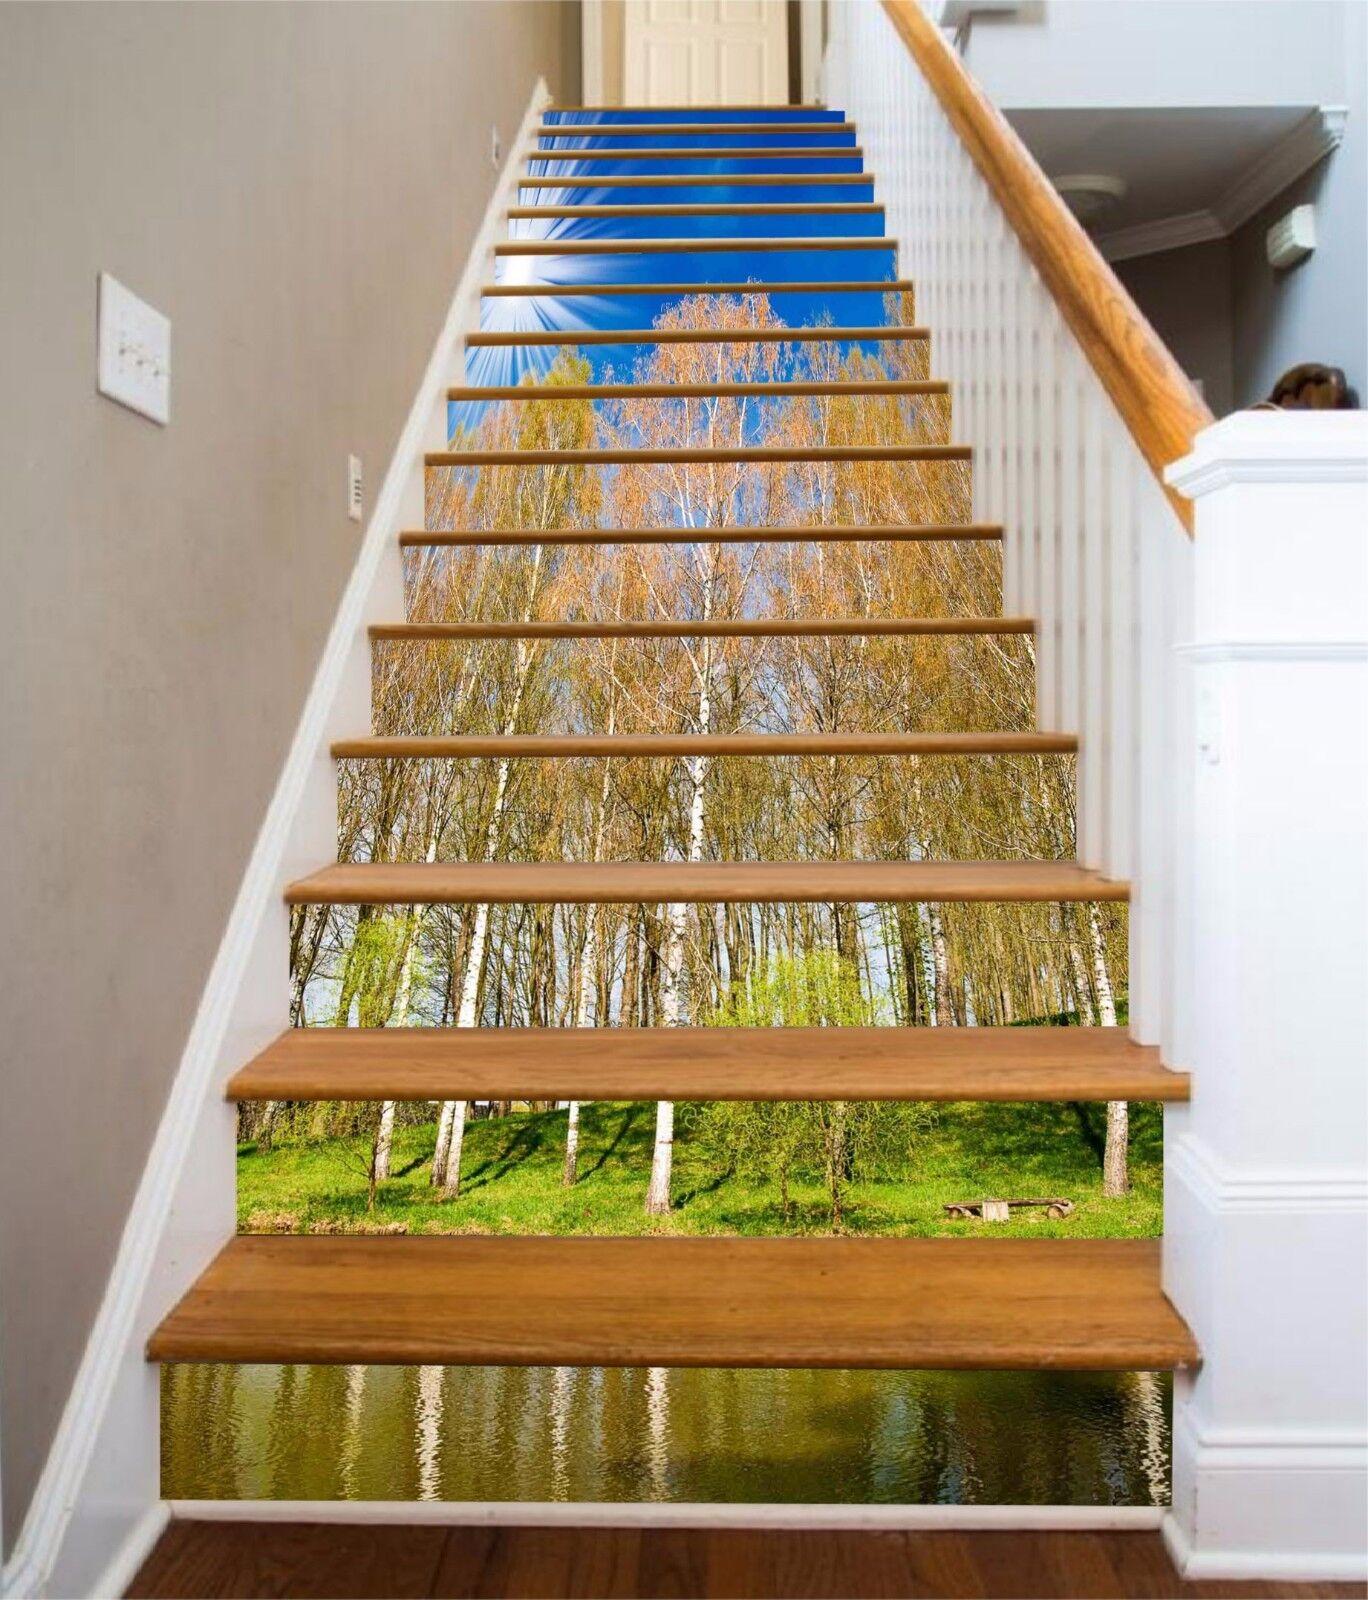 3D Slender Trees 01 Stair Risers Decoration Photo Mural Vinyl Decal Wallpaper AU